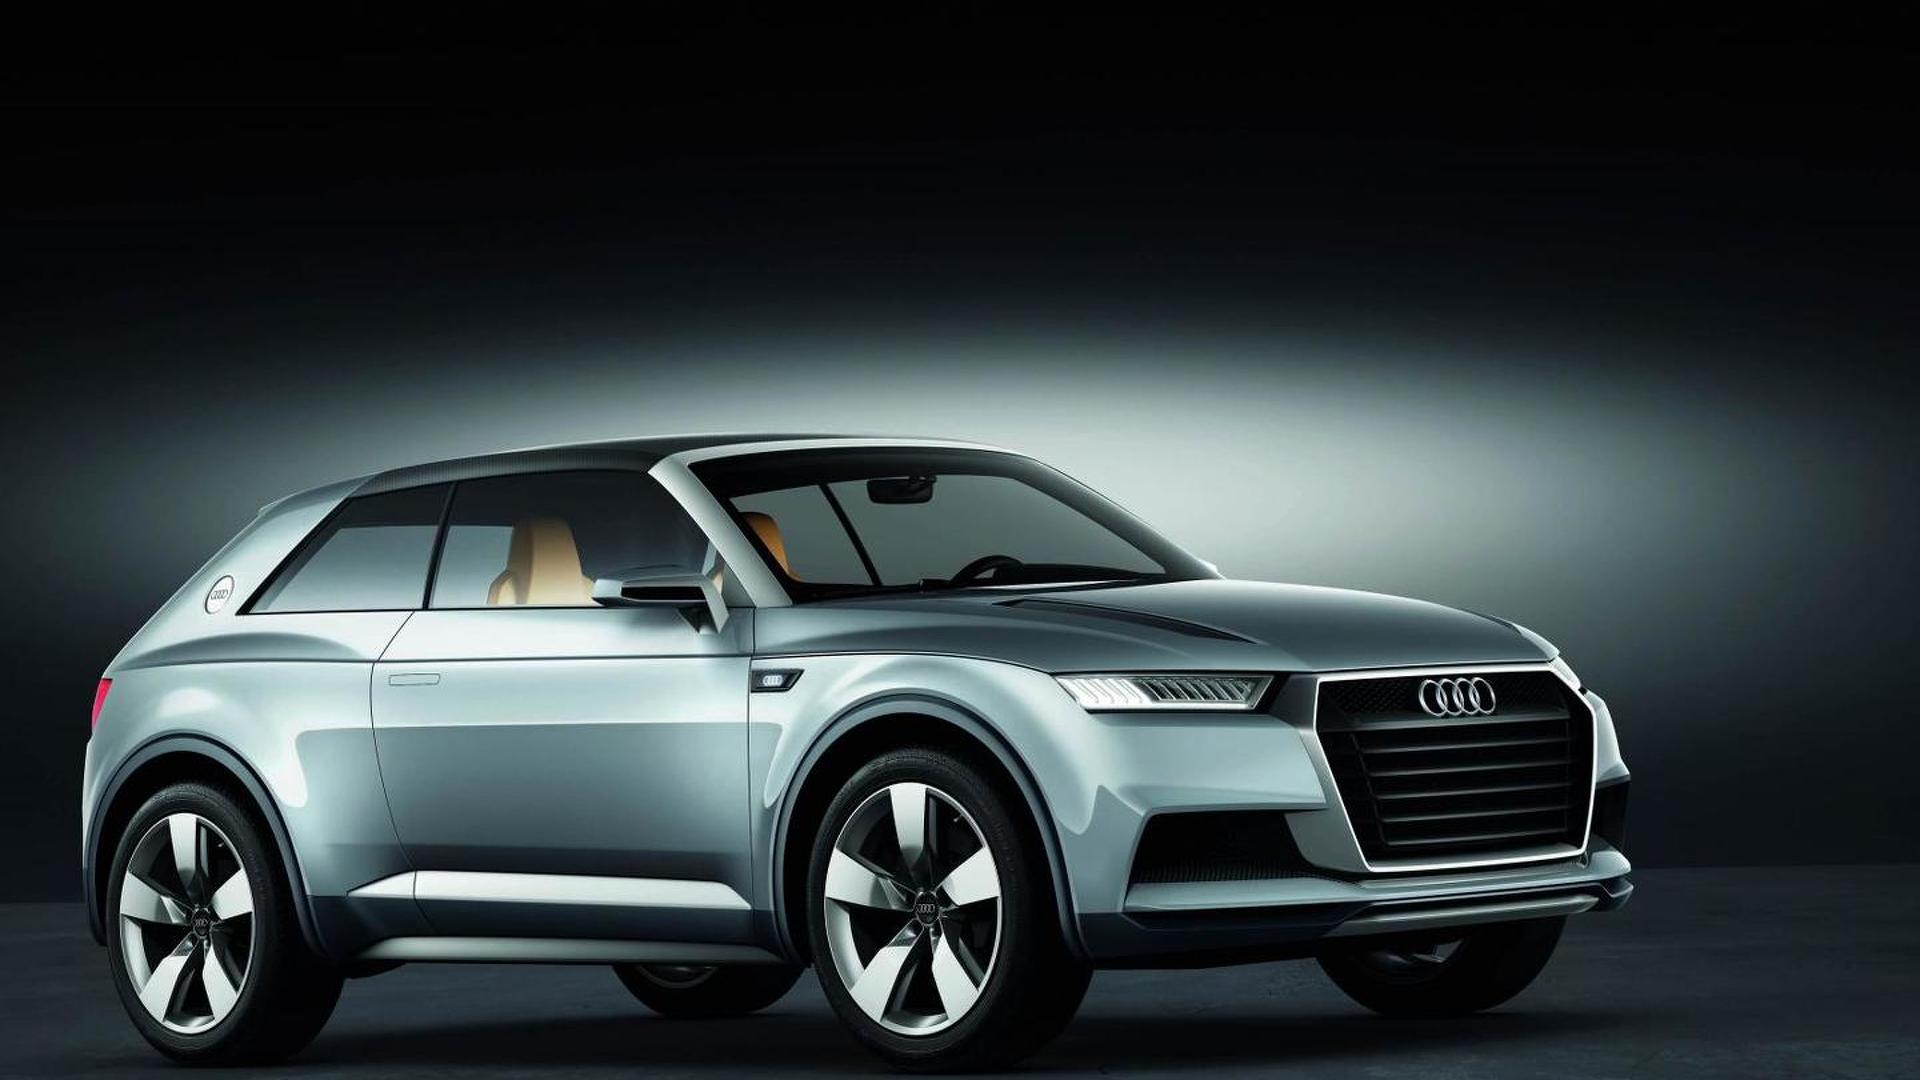 Audi trademarks SQ2 SQ4 Q9 and f tron